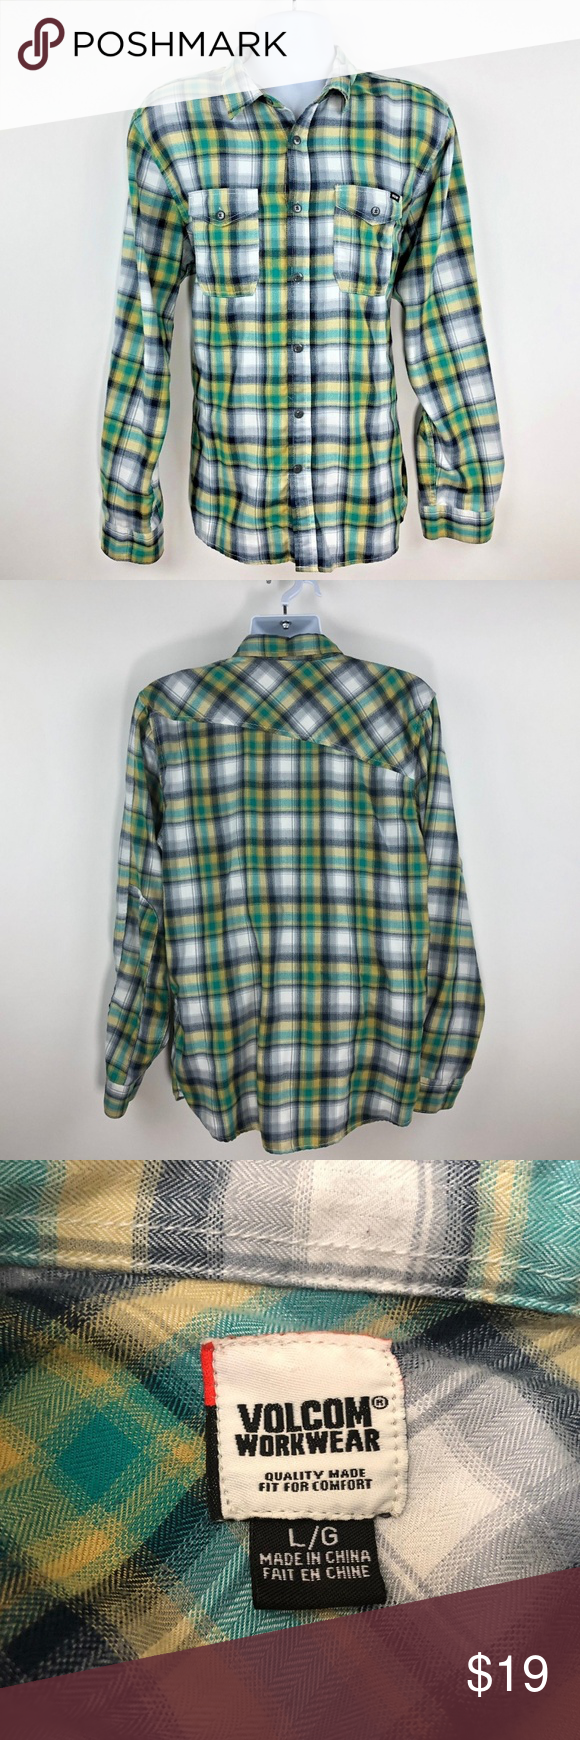 Mens hooded flannel jacket  Volcom Workwear Mens Green Yellow Plaid Shirt  My Posh Closet